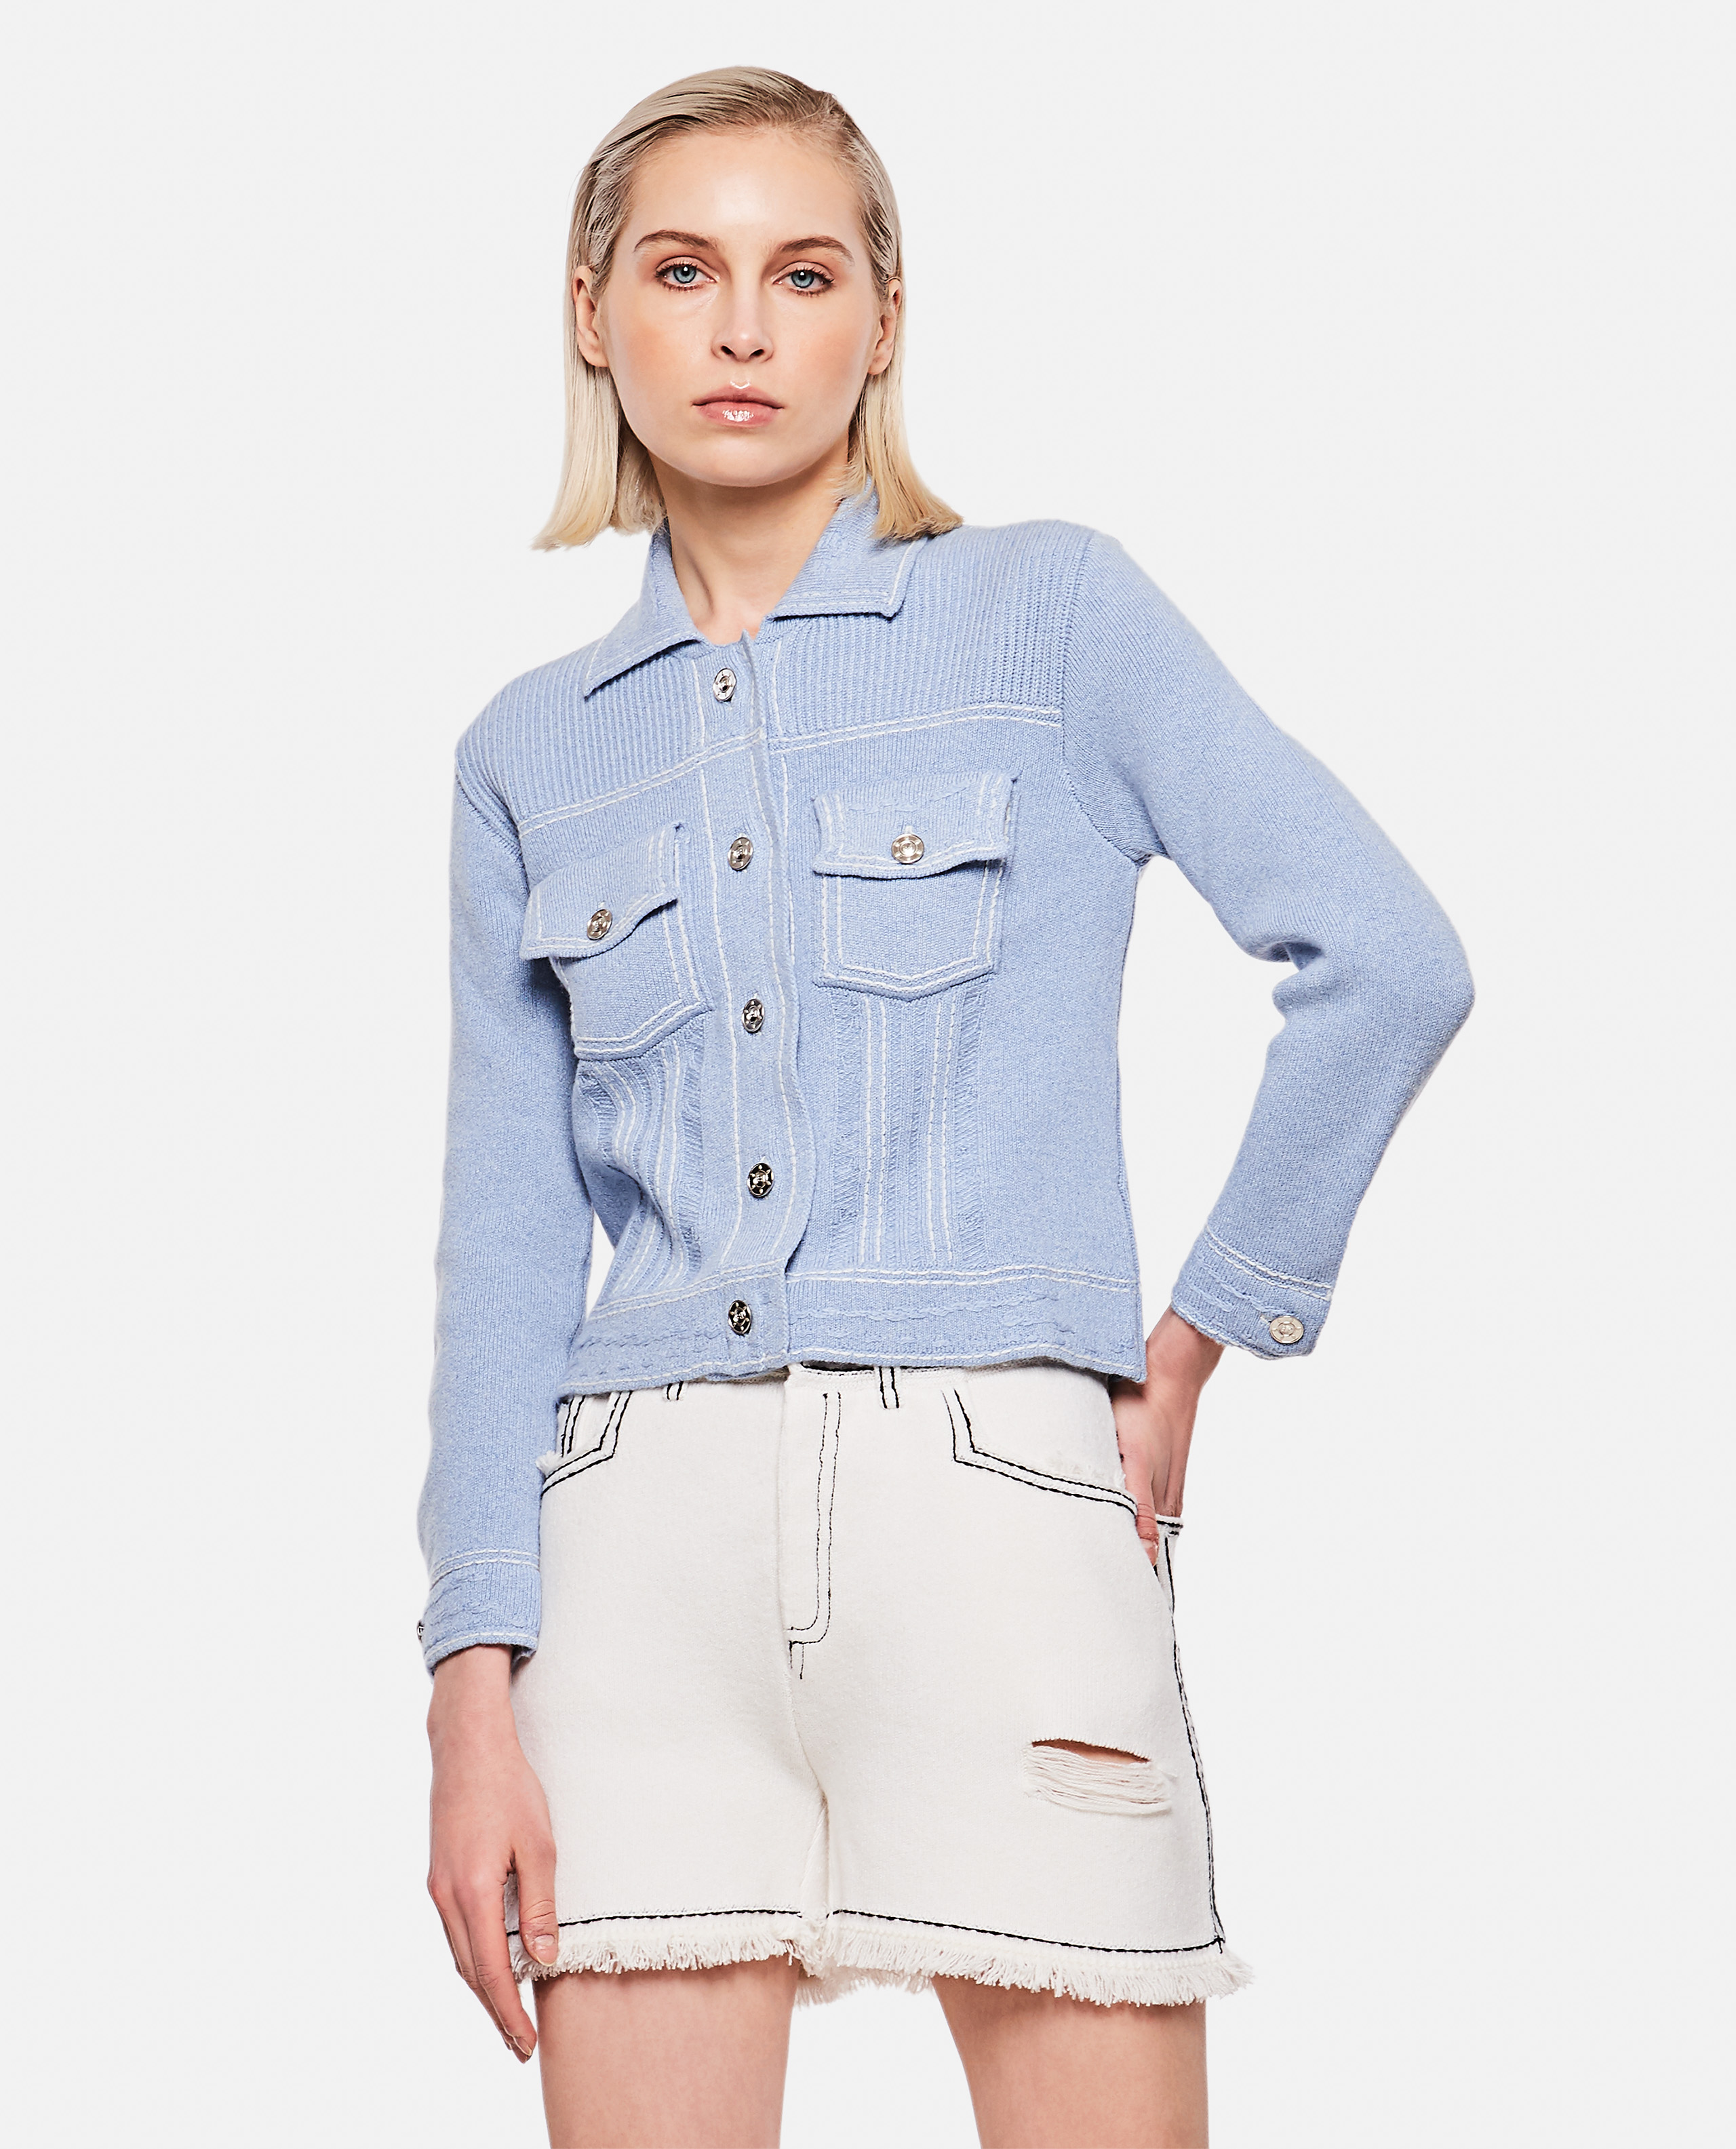 Denim-style cotton blend cardigan